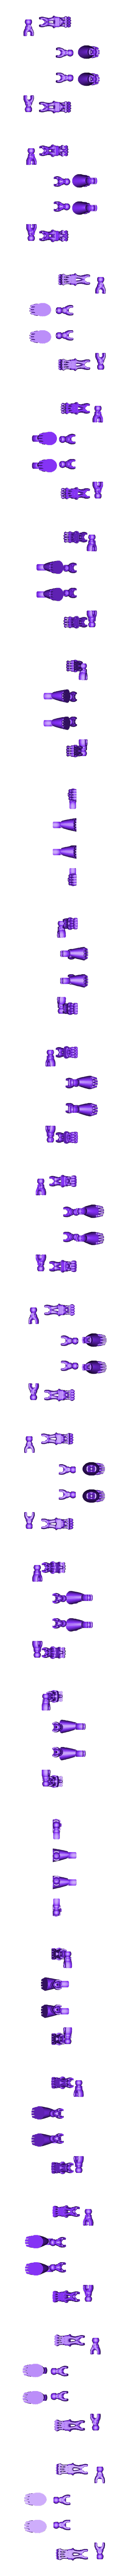 Klicket_Bony_-_hands_feet.stl Télécharger fichier STL gratuit Klicket v4 - Boney • Plan à imprimer en 3D, gotbits